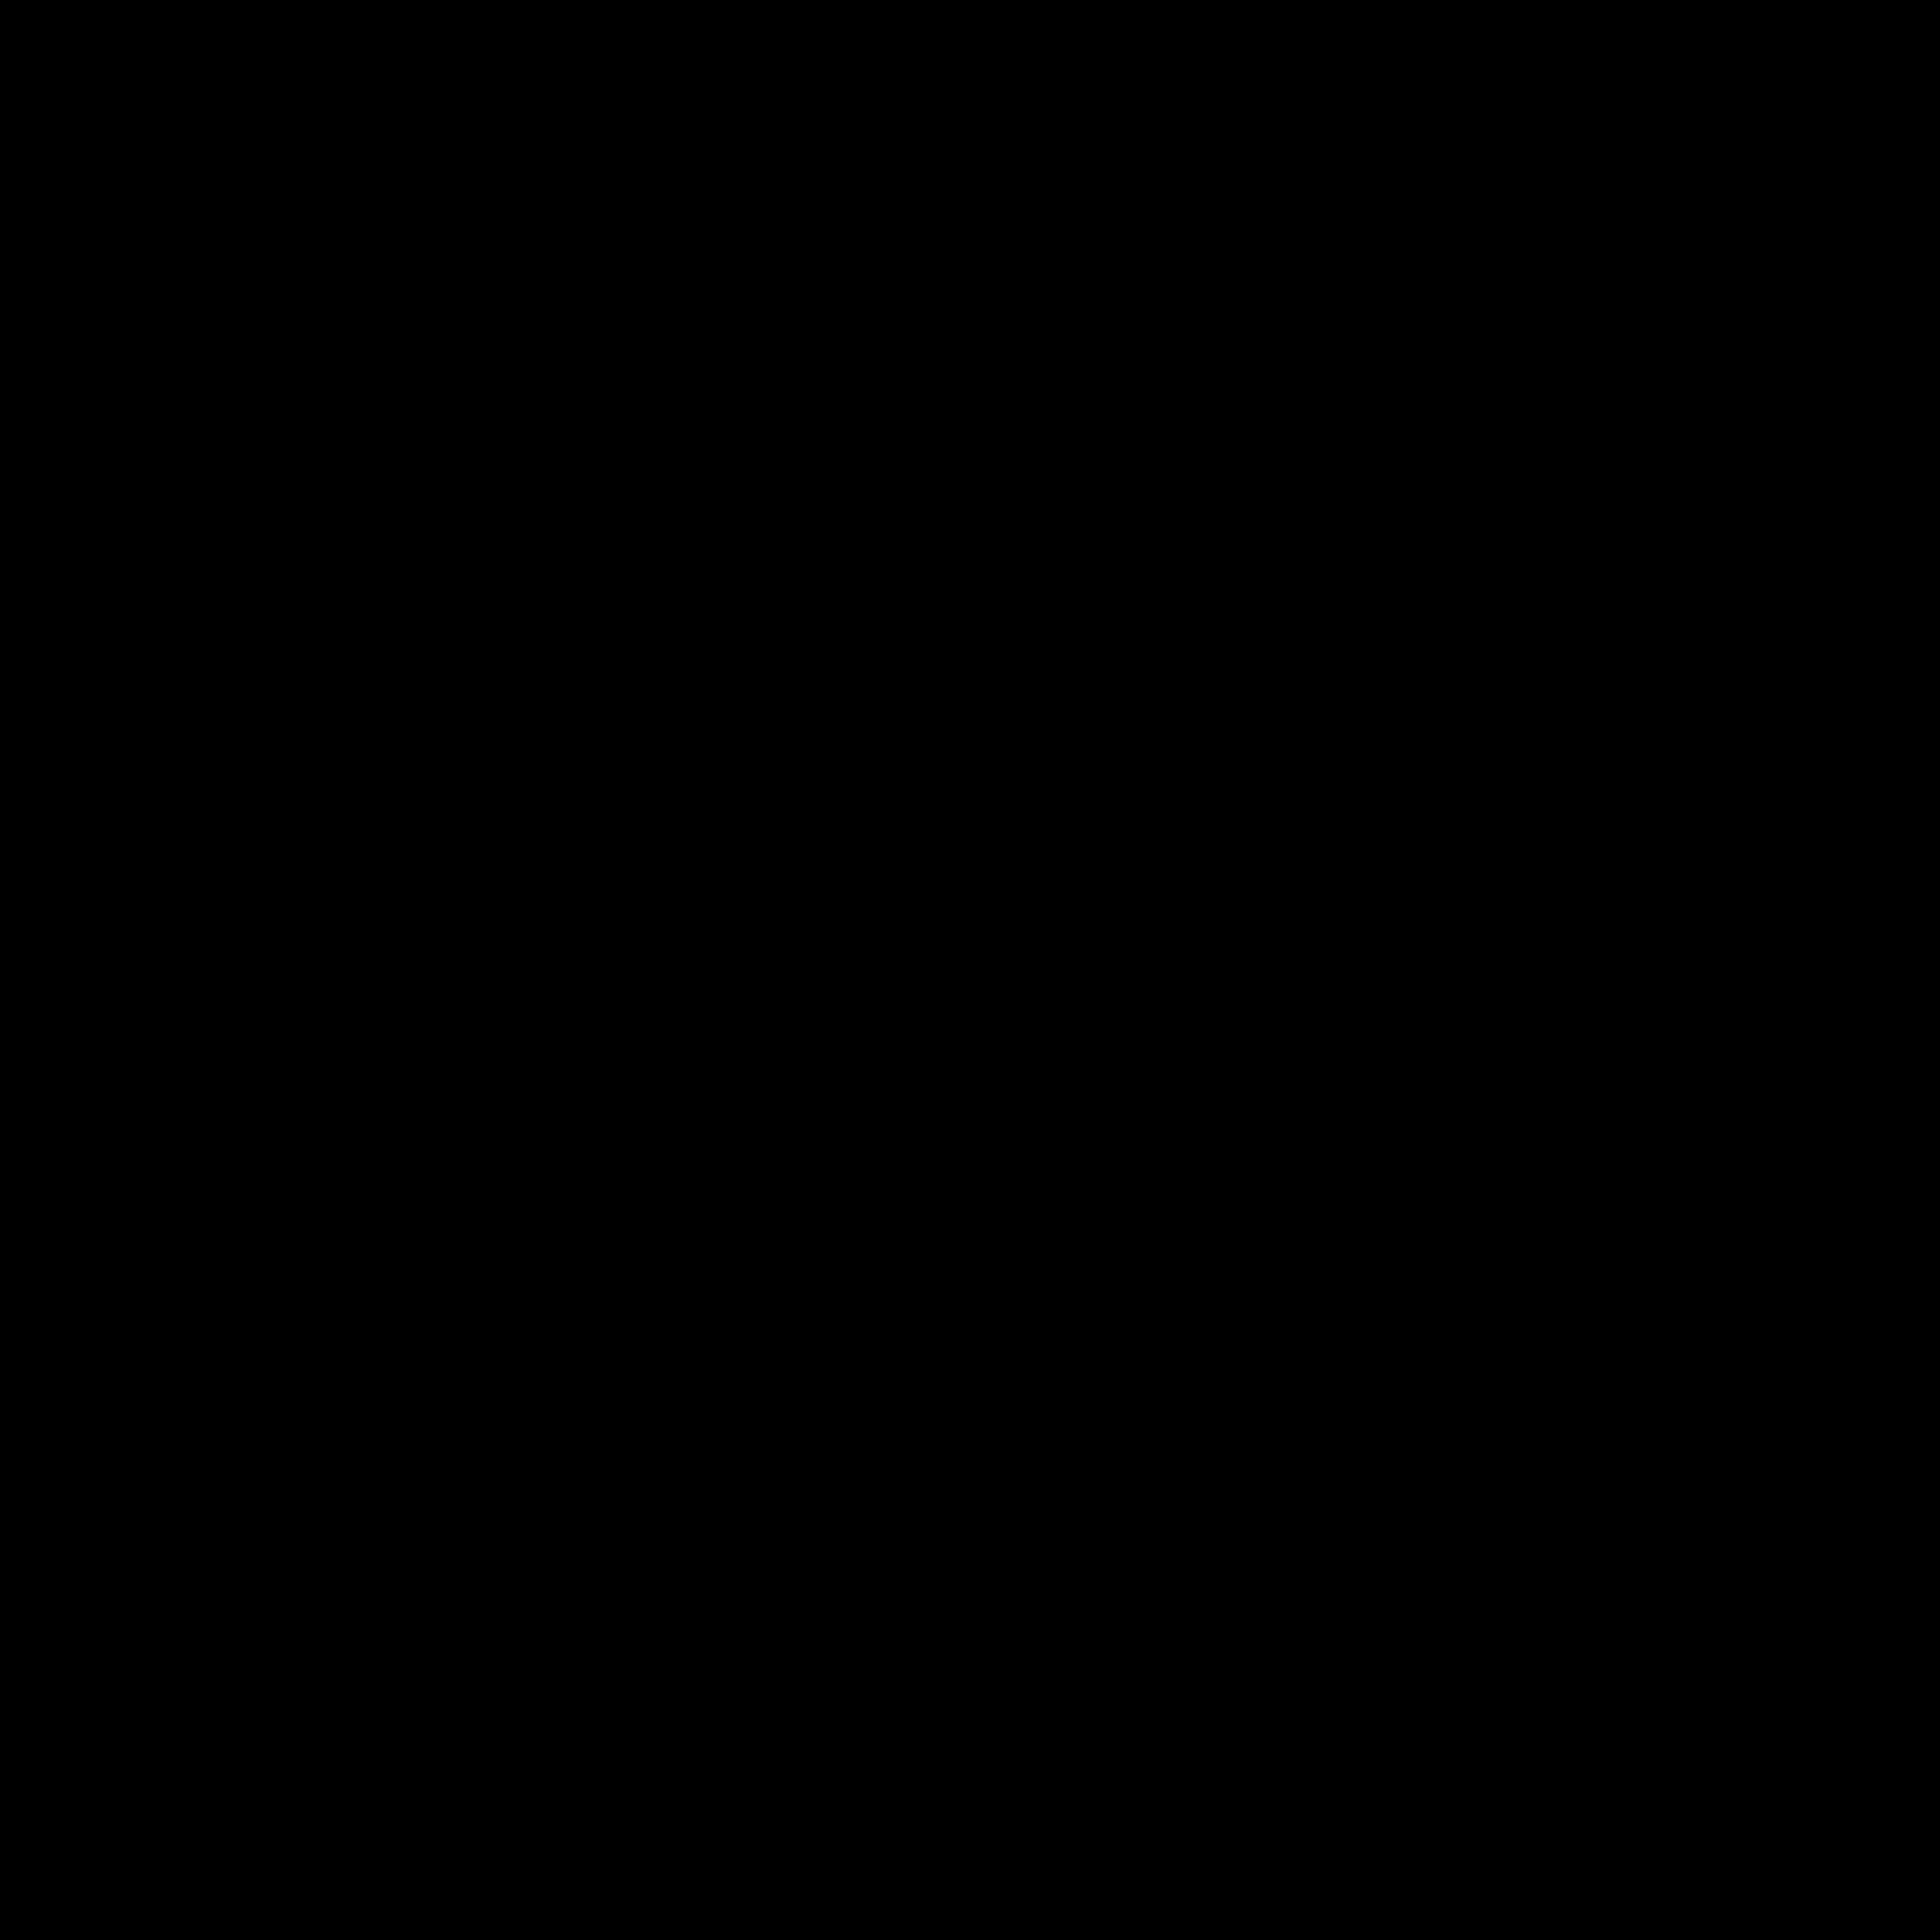 the UFI winner of the technology award 2017 logo